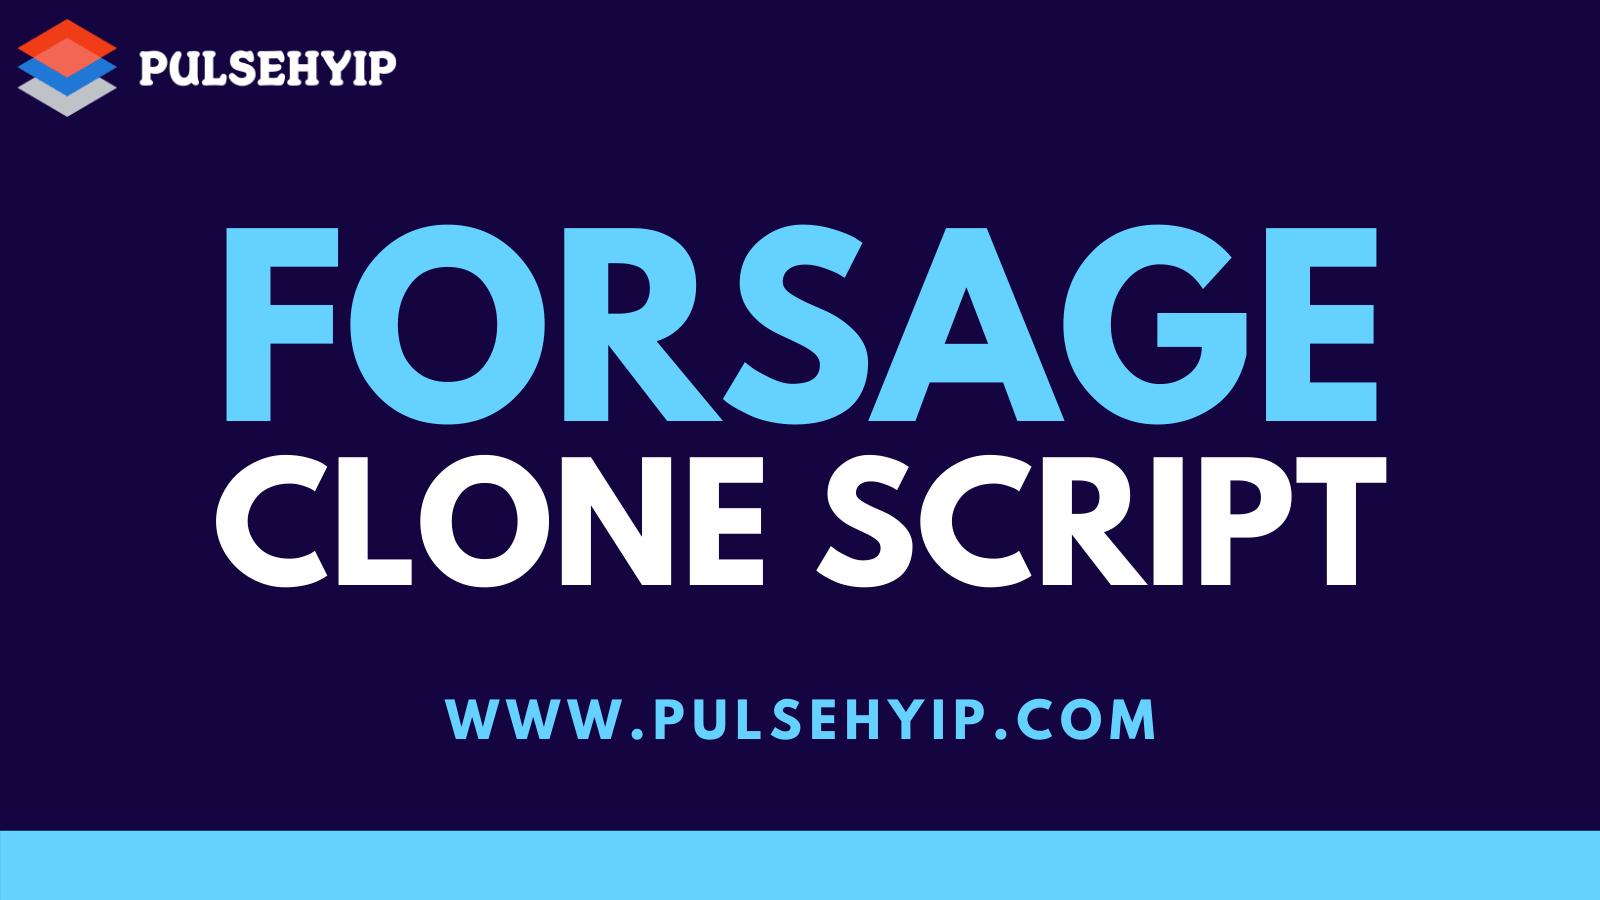 Forsage Clone Script to Start 100% Decentralized Smart Contract MLM Platform